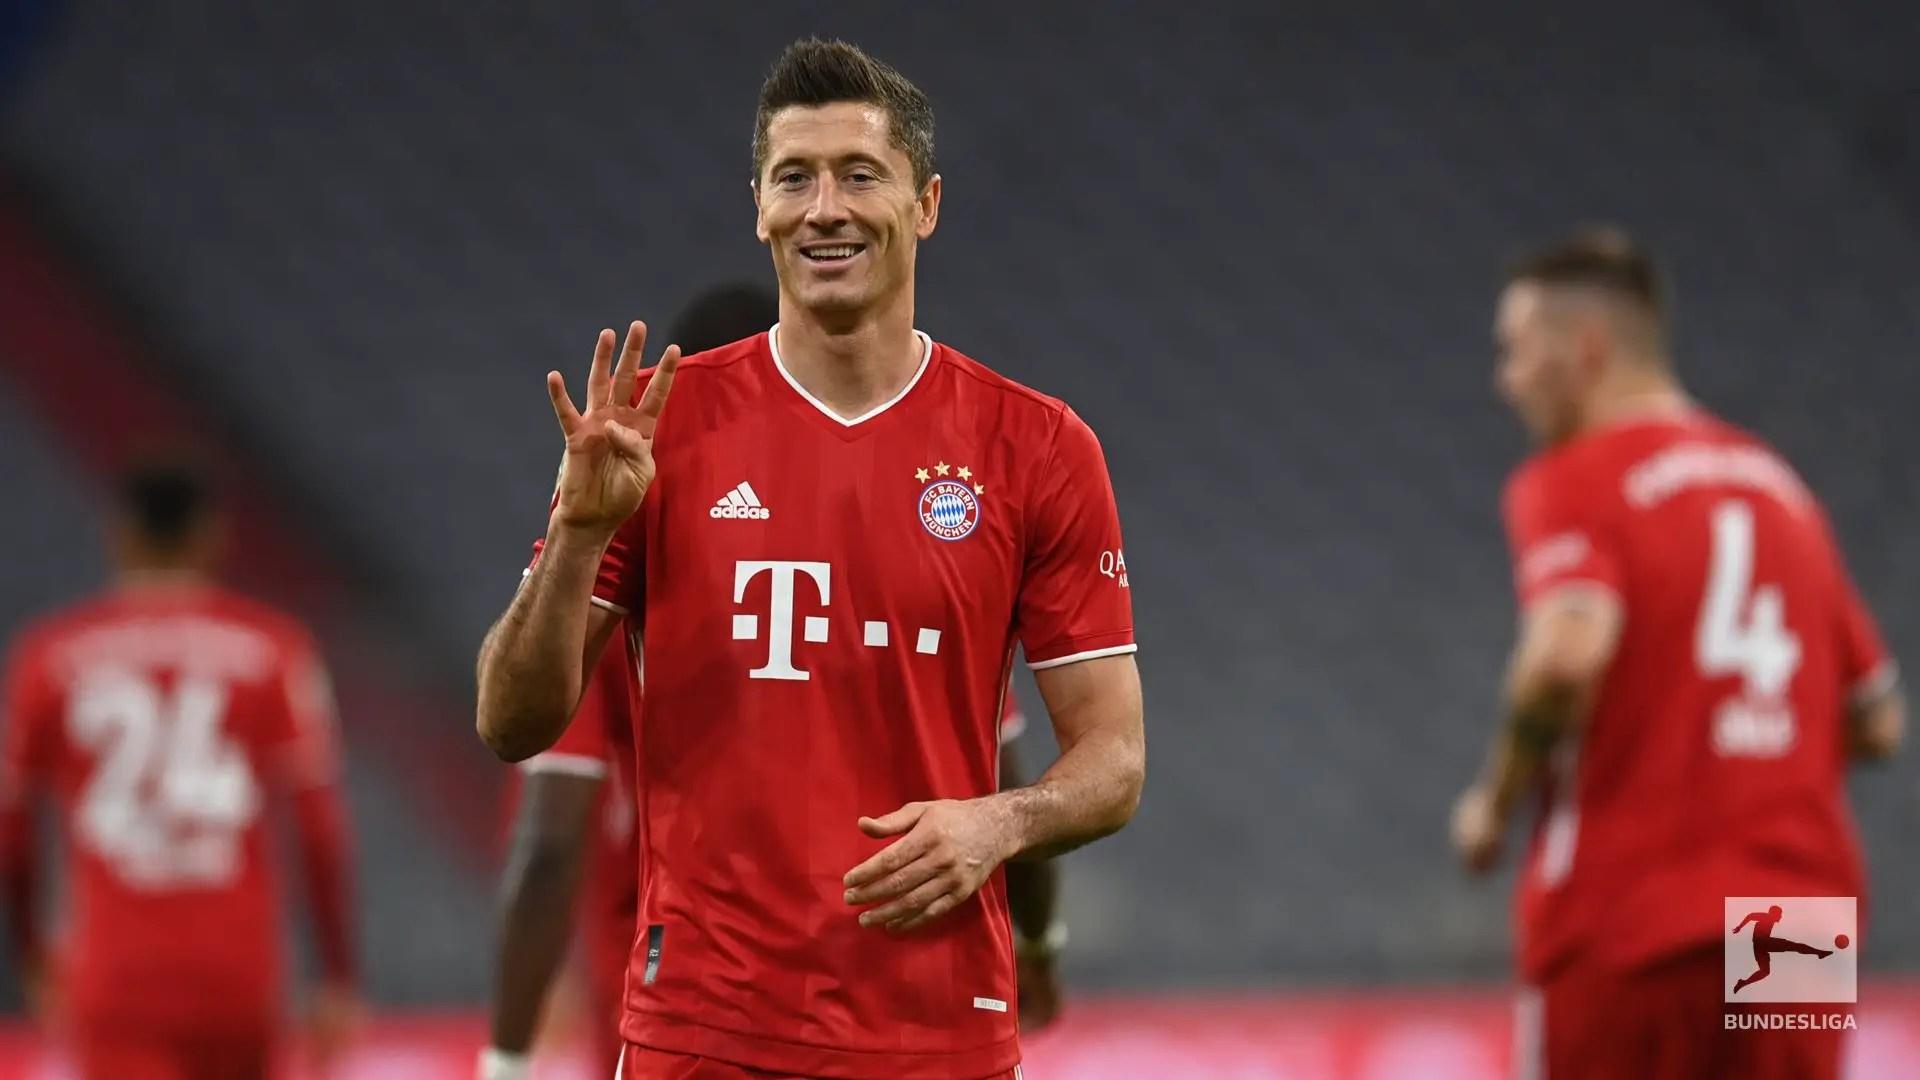 Bundesliga: Lewandowski Bags Four Goals, Creates Milestone, As Bayern Overcome Hertha Berlin In Seven-Goal Thriller